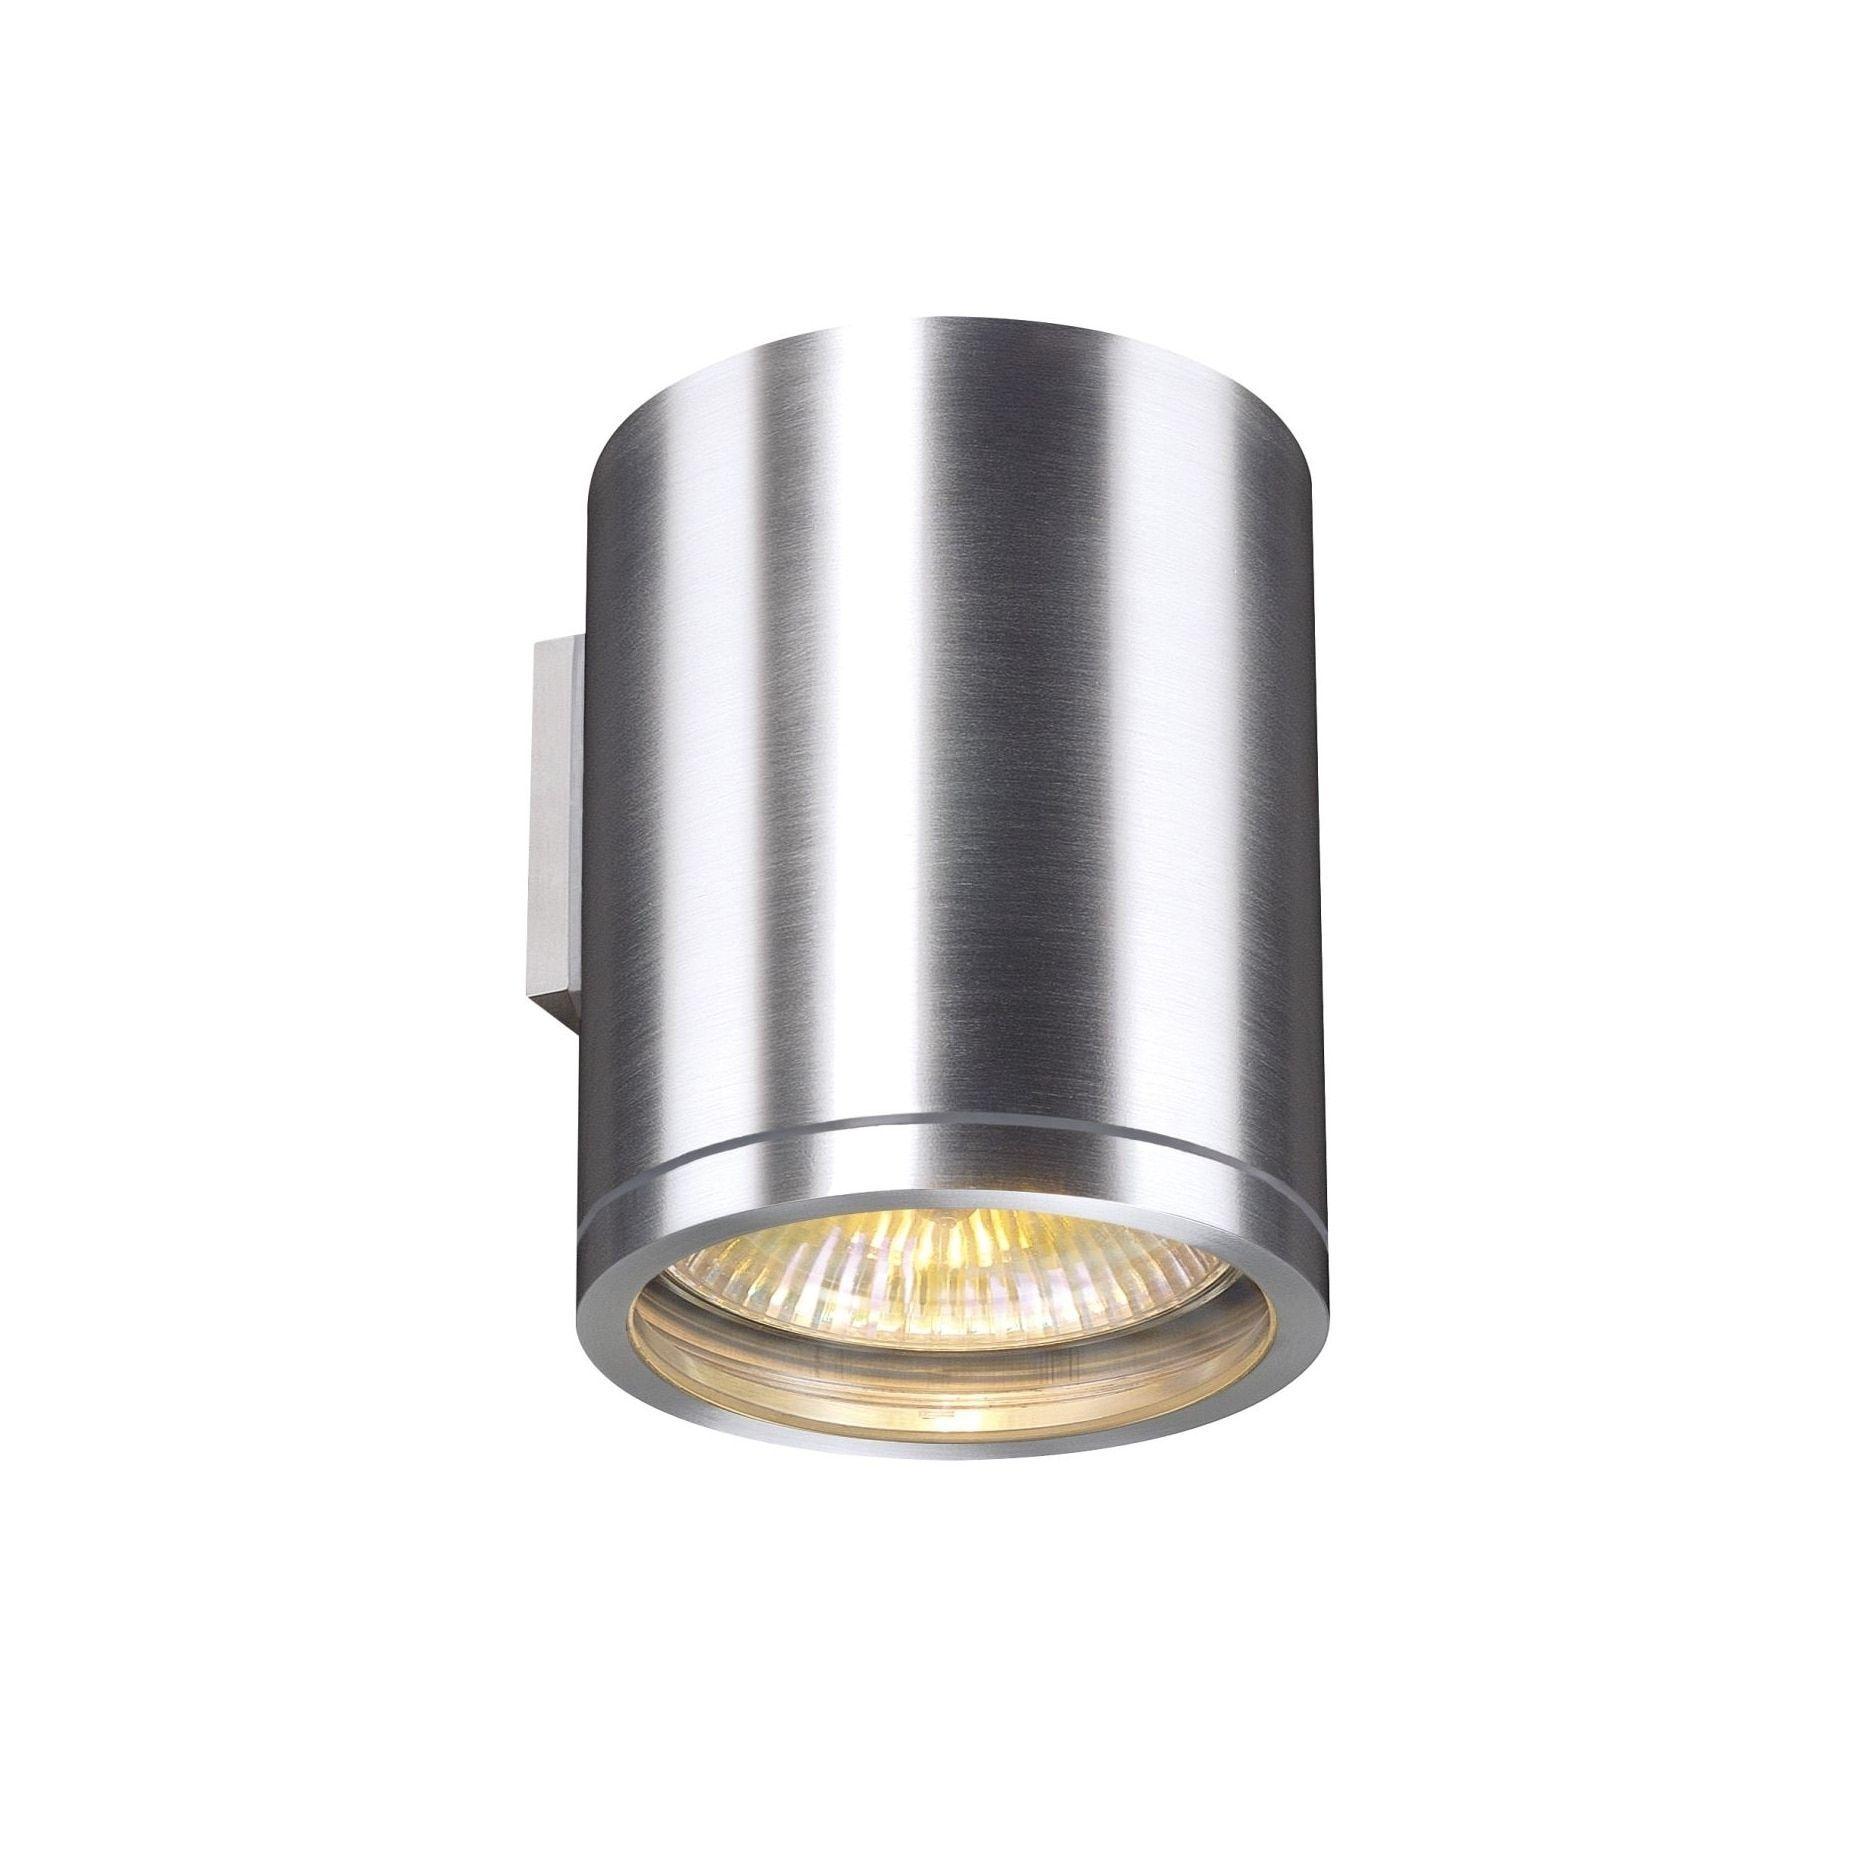 Slv lighting rox light brushed aluminum wall lamp brushed